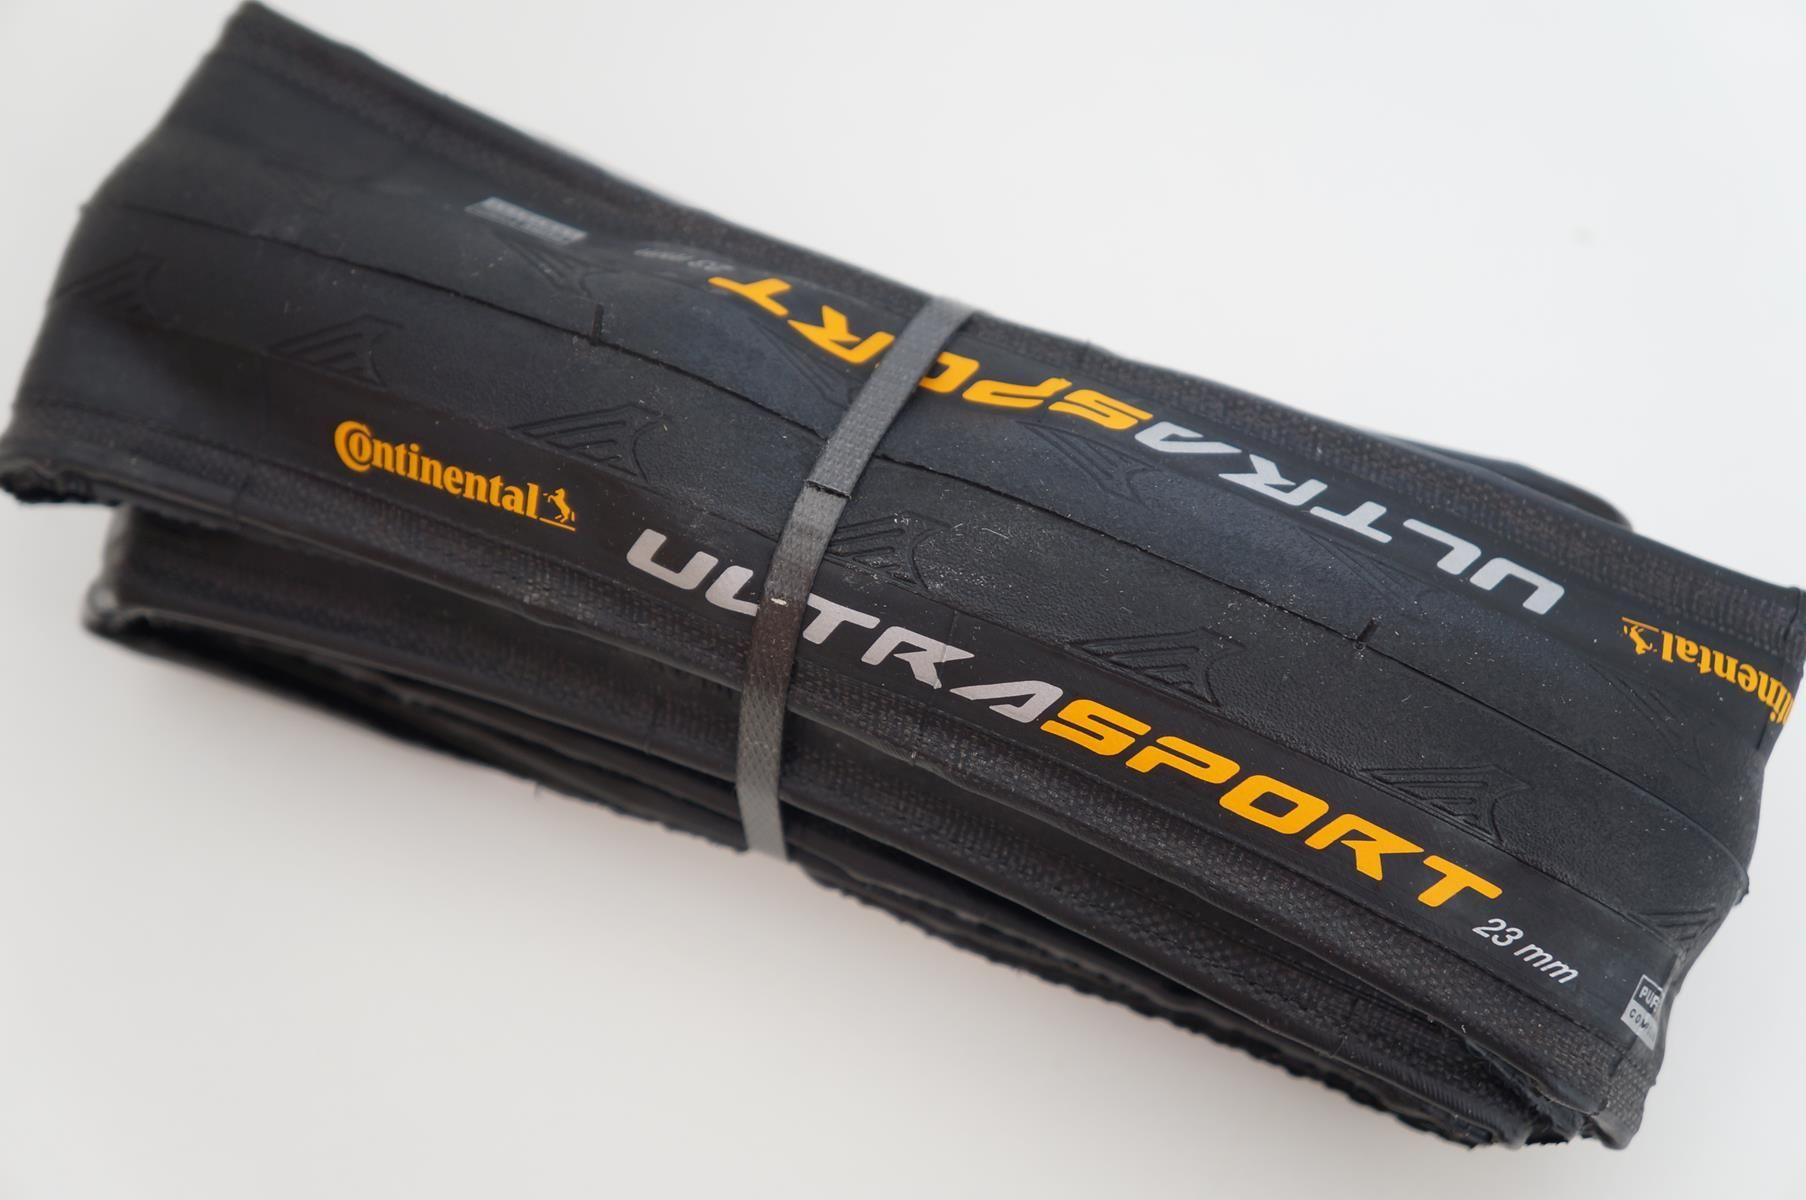 Pneu Continental Ultra Sport II Folding Road Tyre - 700c - Black / 700c / 25mm (p/ estrada, asfalto, road, speed)